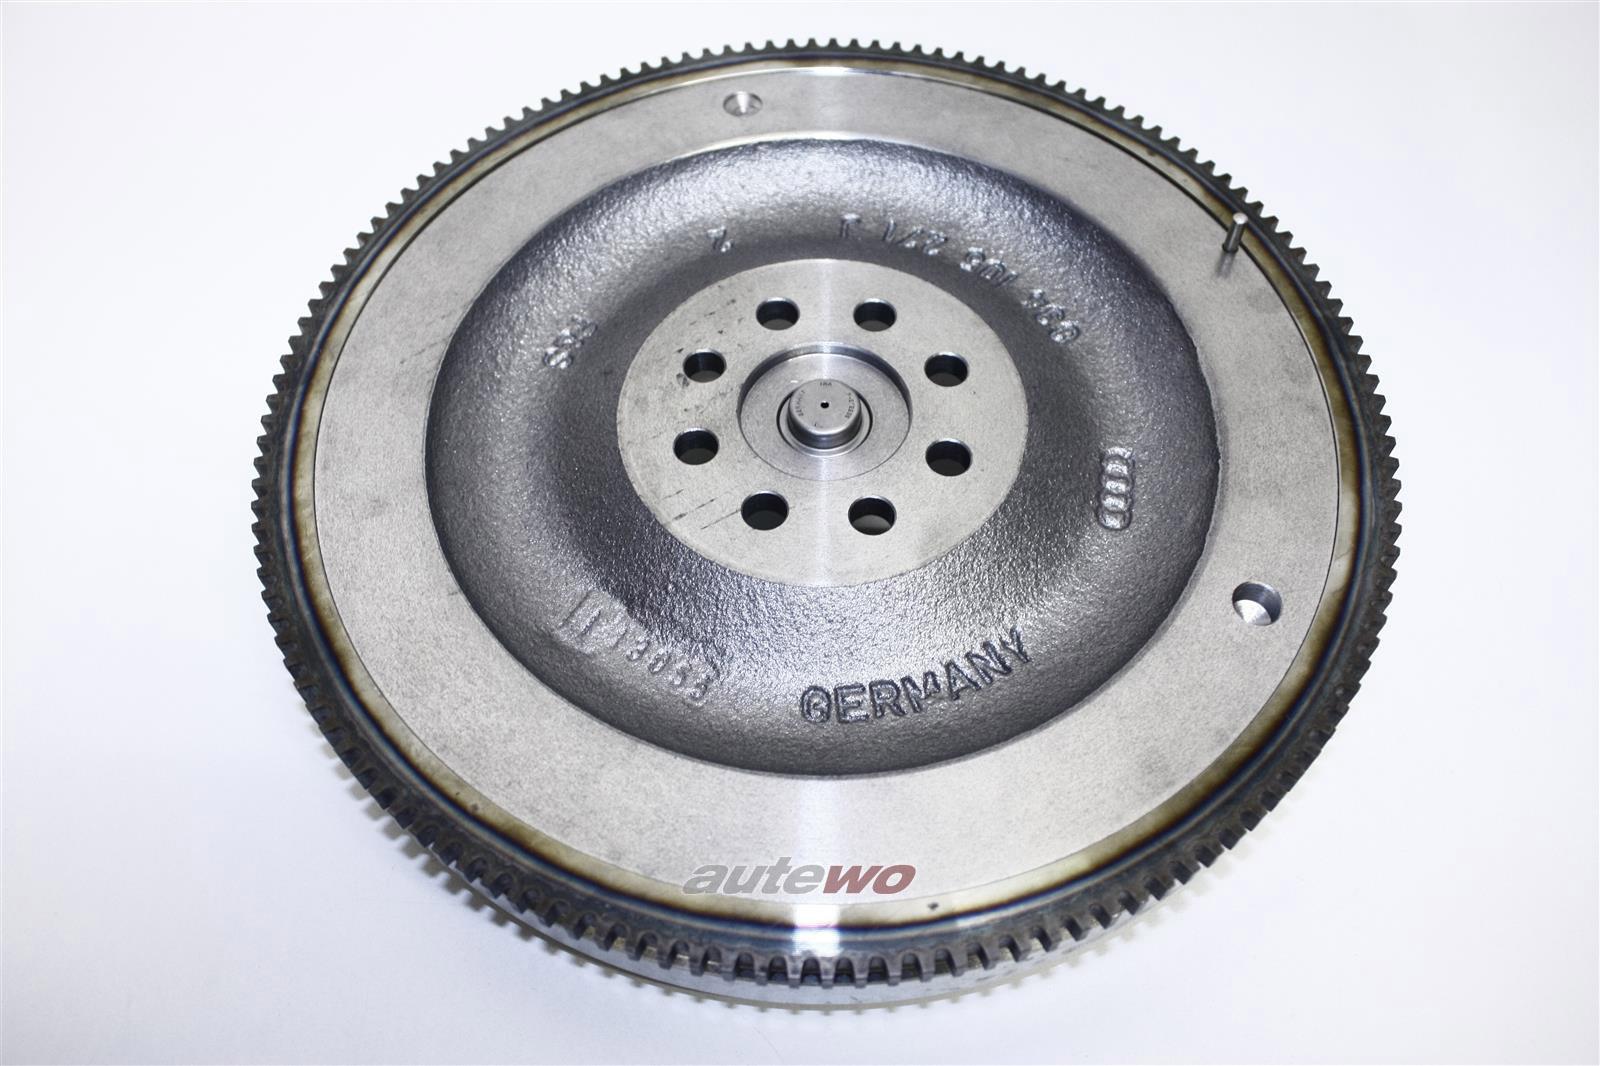 034105270AA NEU Audi S2 Coupe Typ 89 2.2l 20V Turbo 3B Ein-Massen-Schwungrad